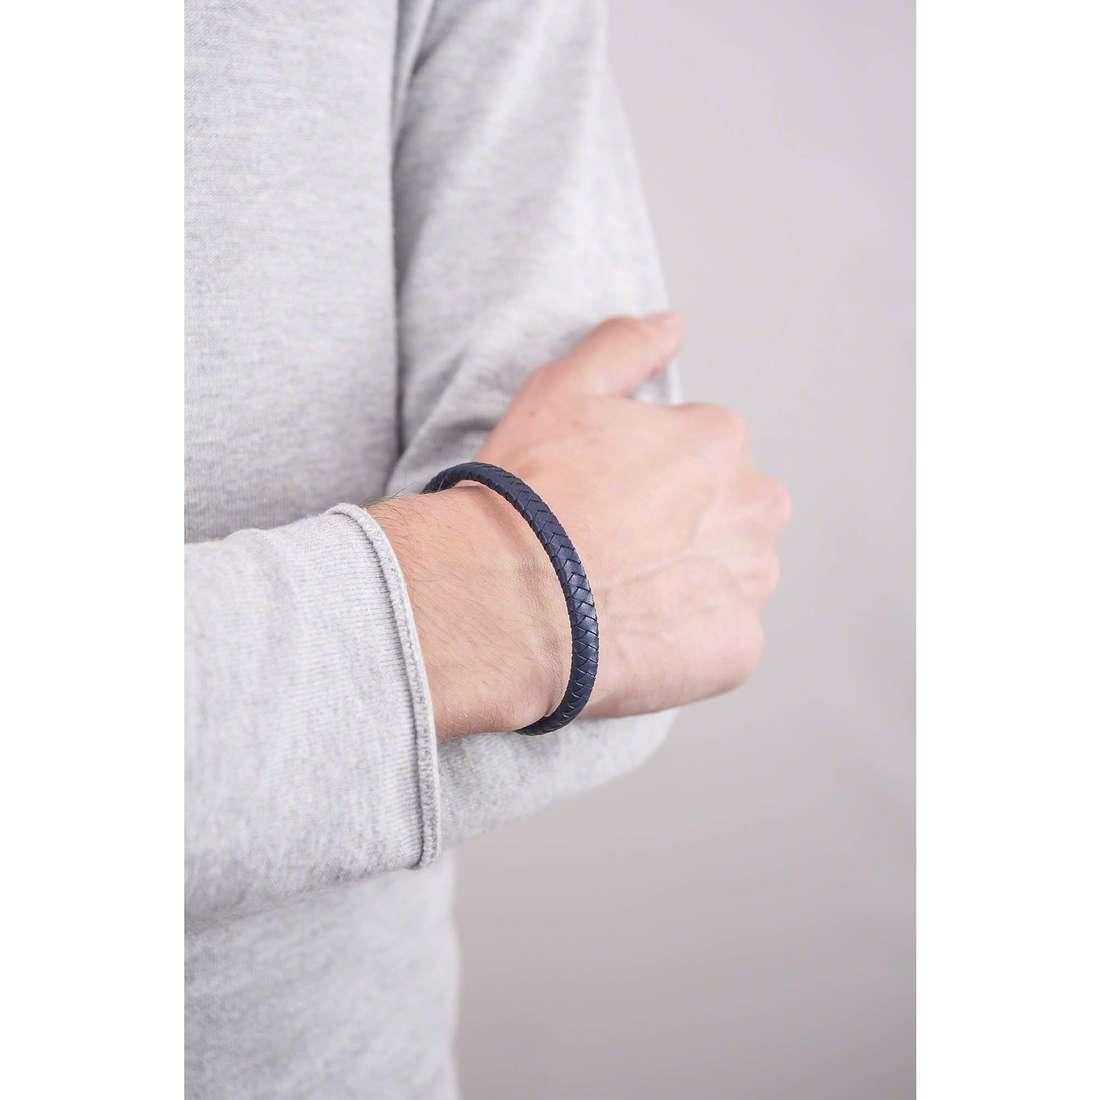 4US Cesare Paciotti bracciali Steel uomo 4UBR1308 indosso